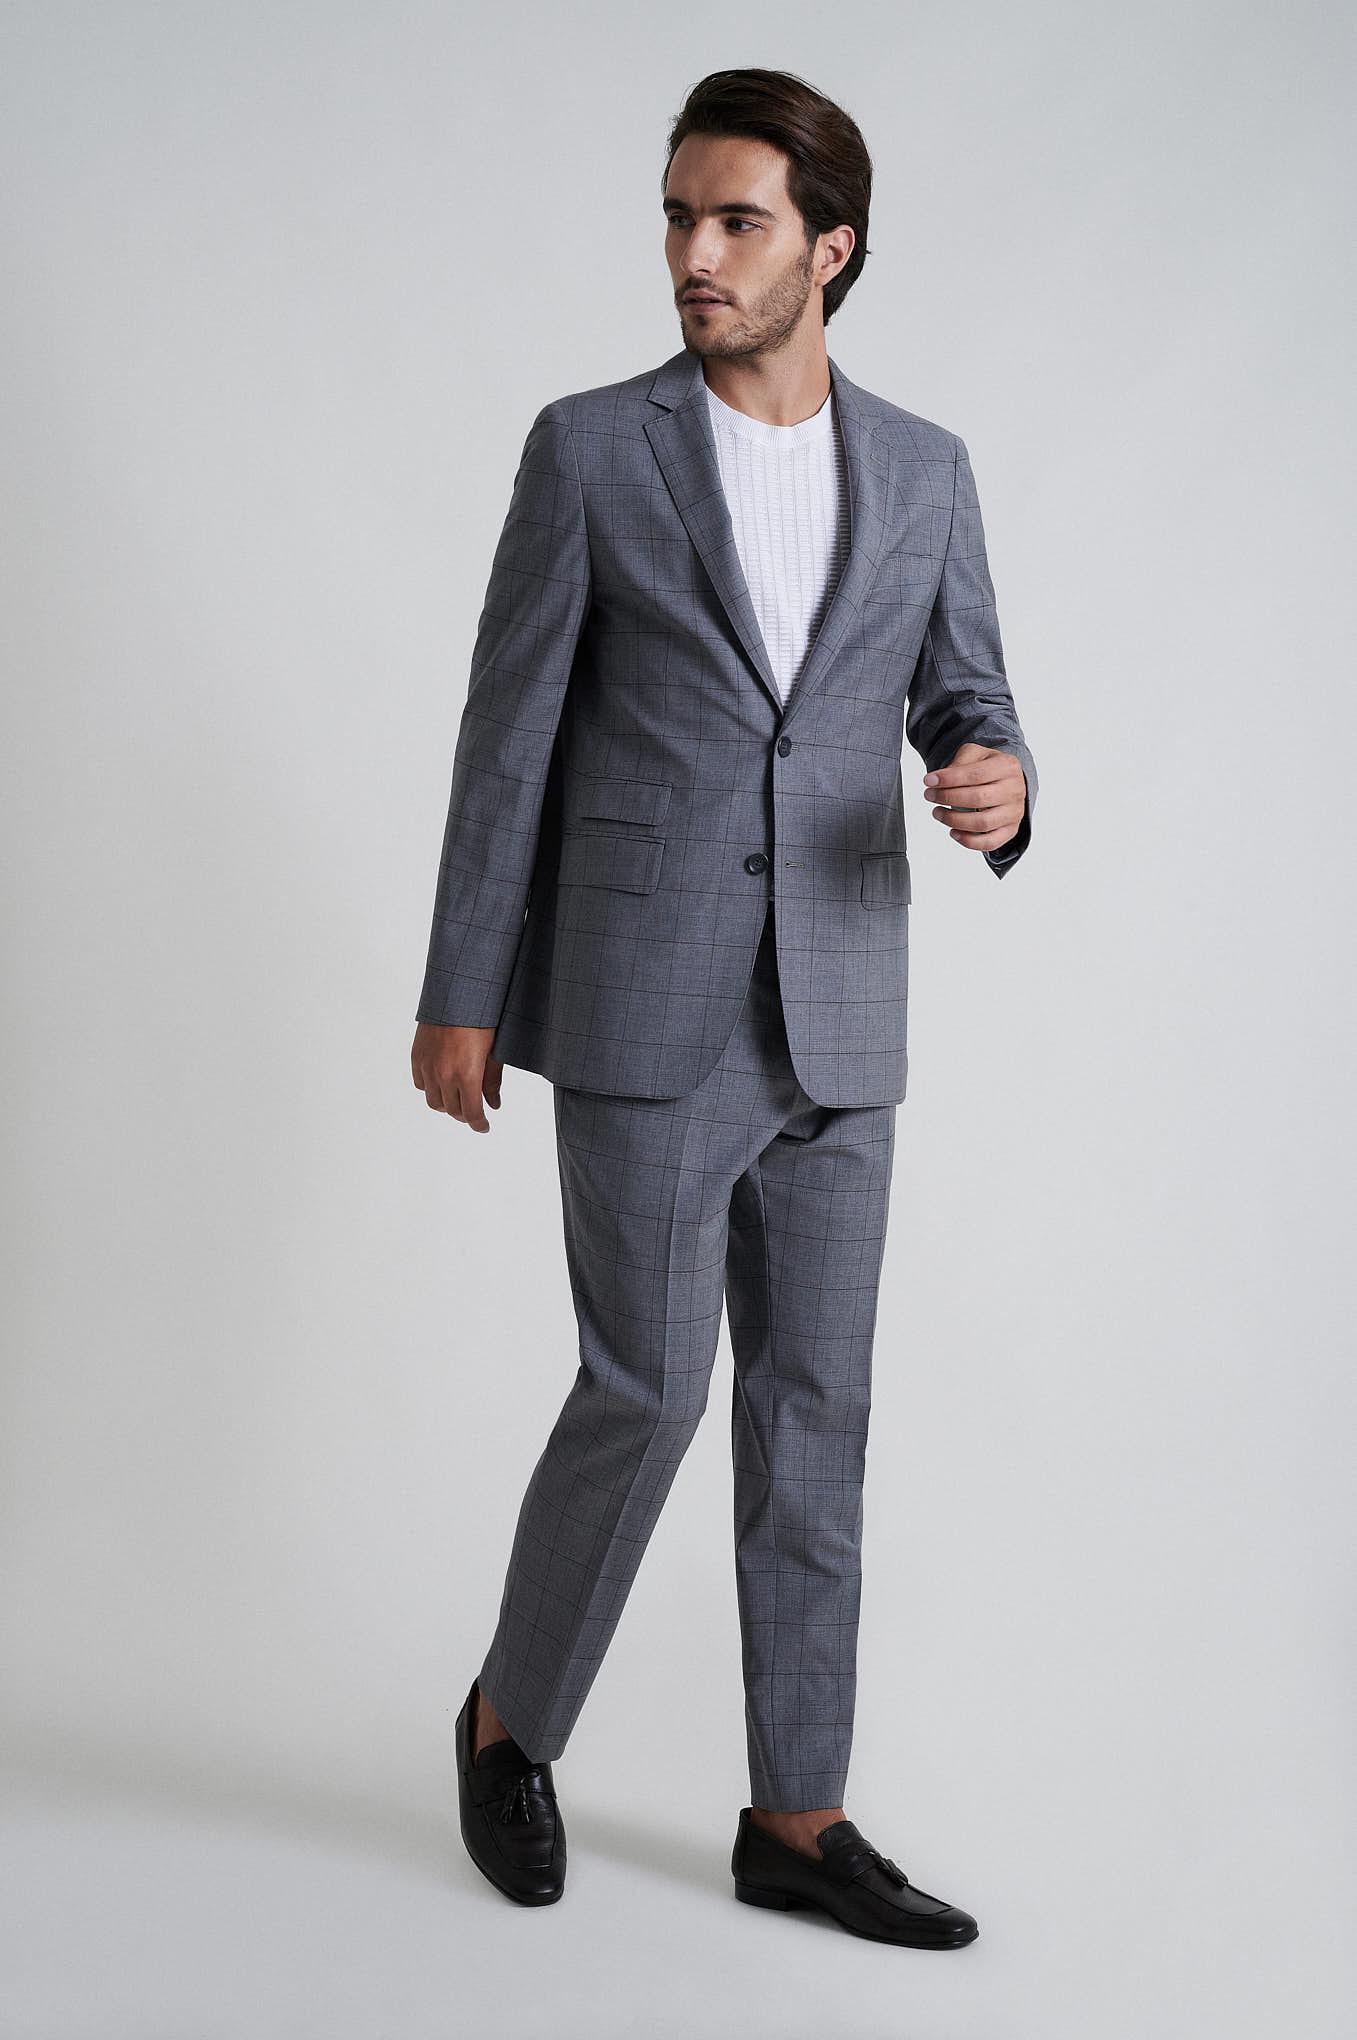 Suit Grey Formal Man